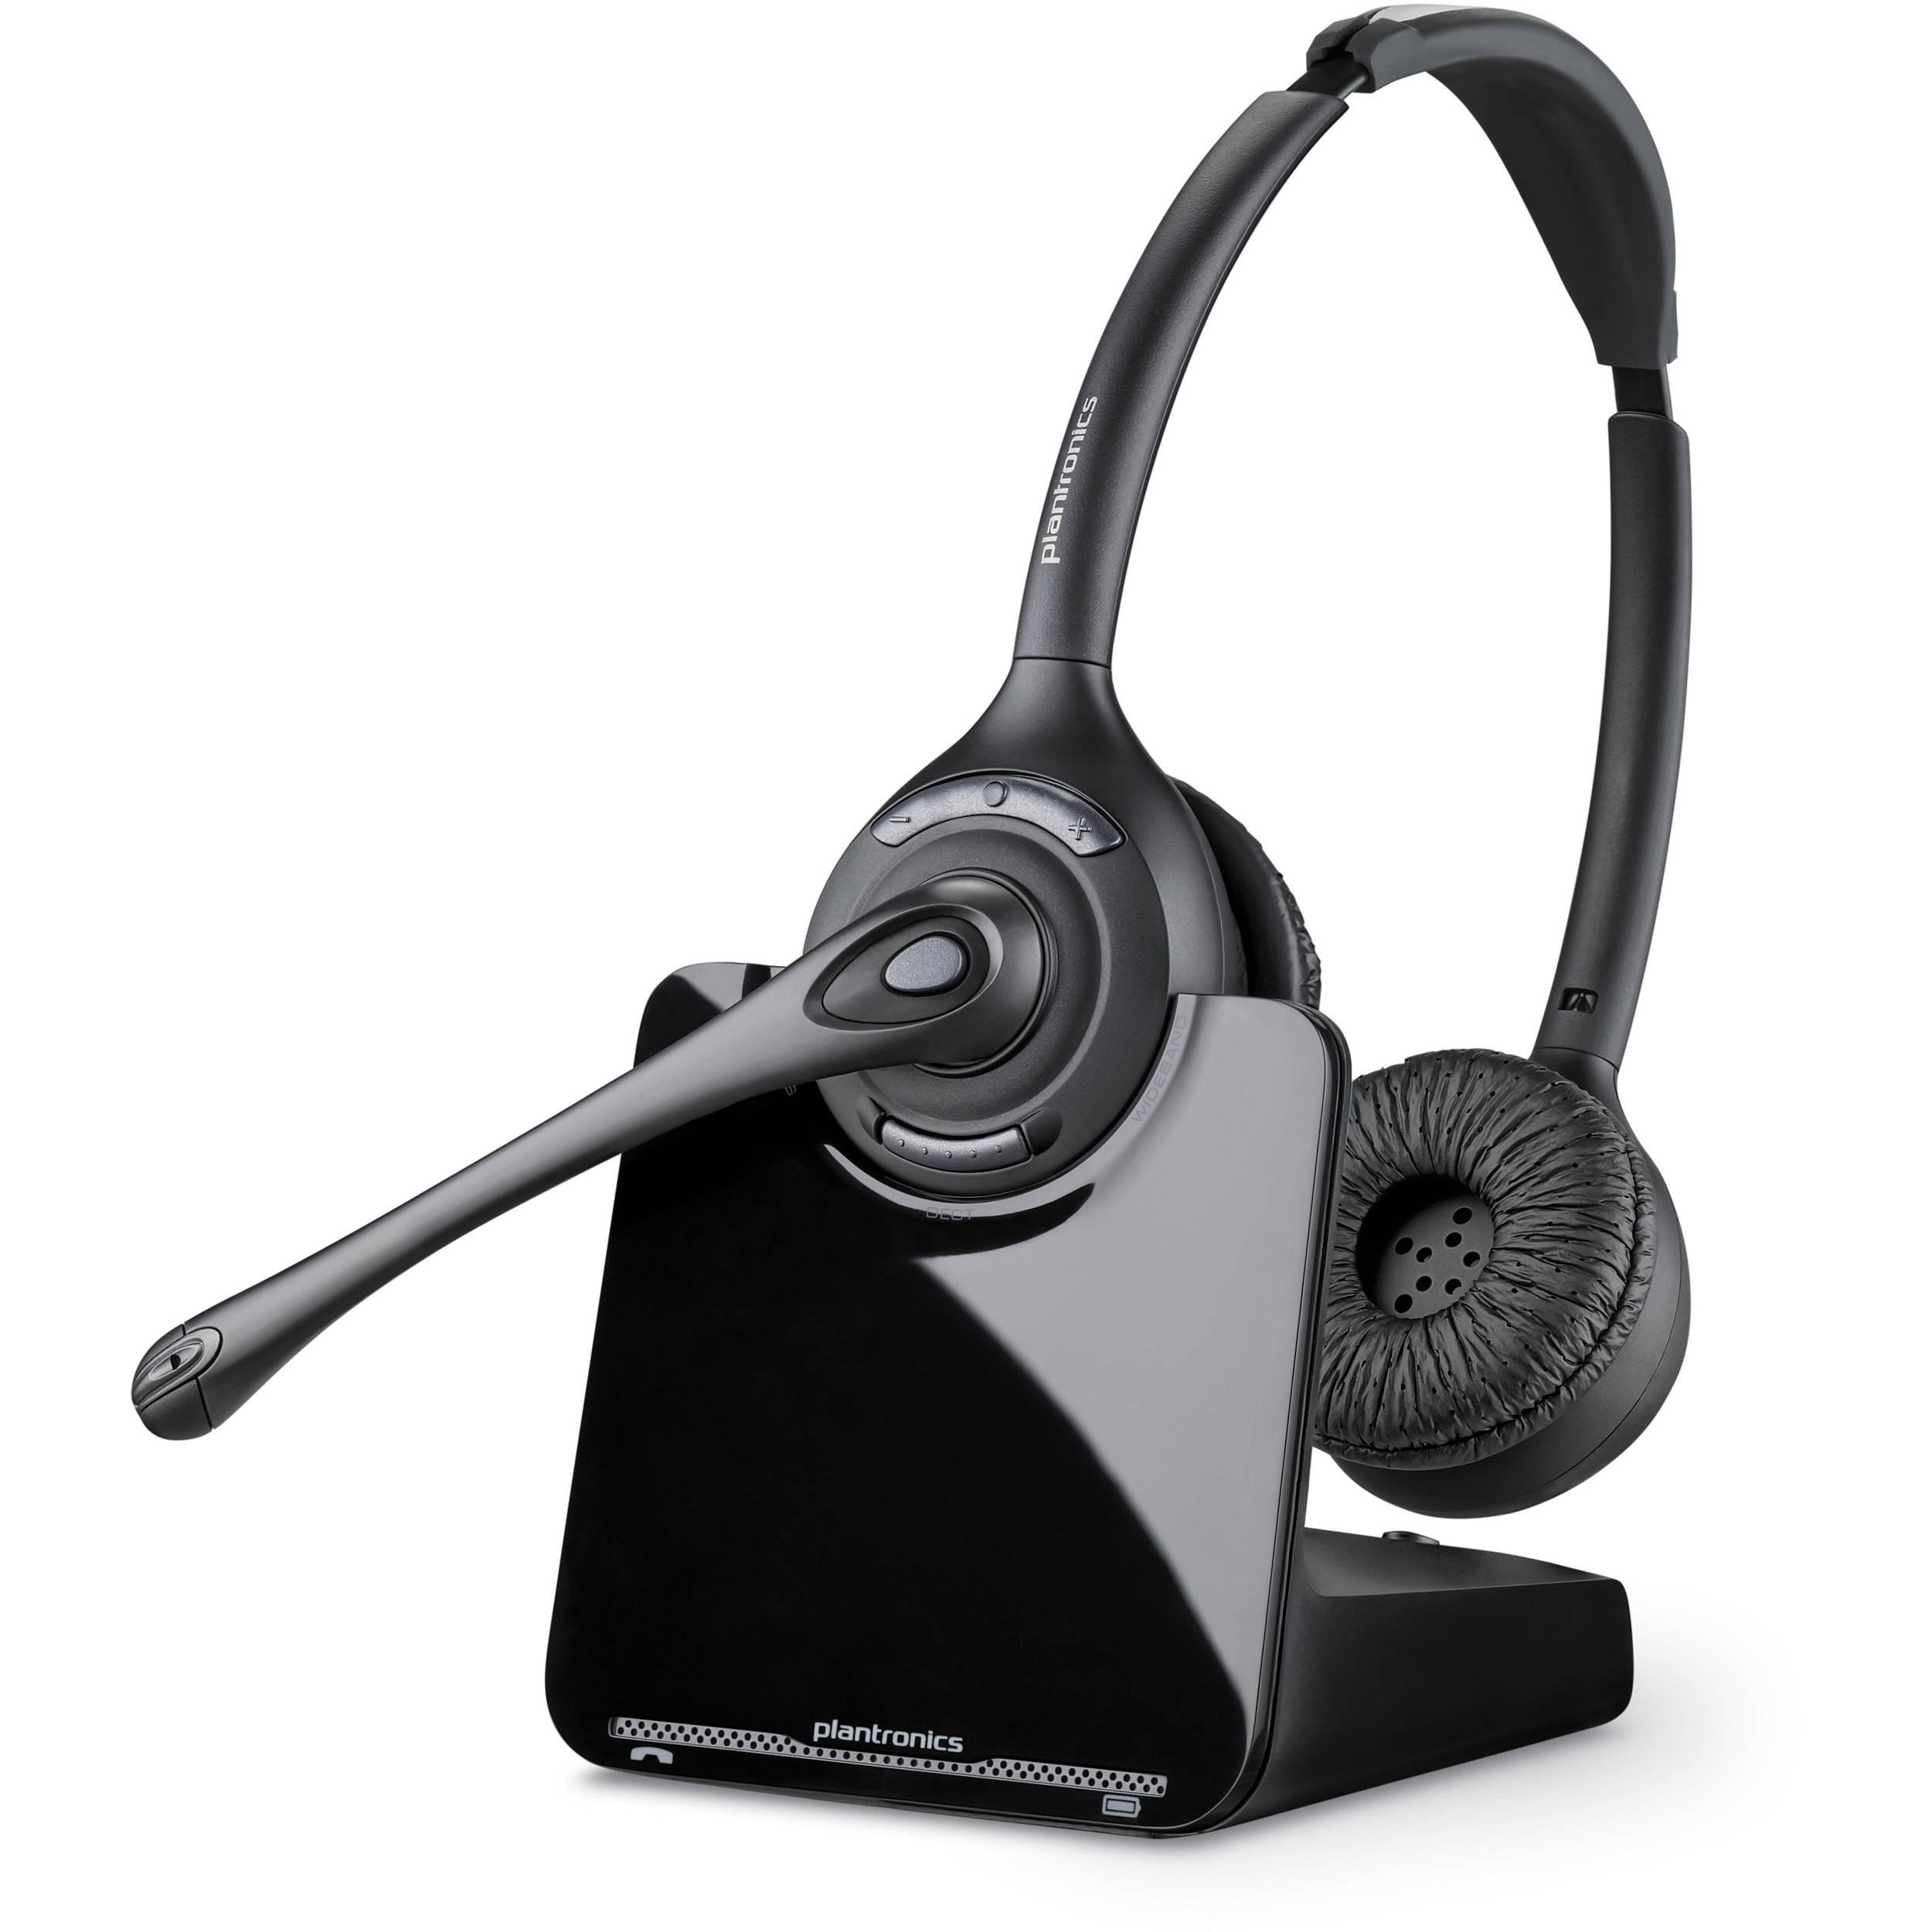 Plantronics Cs520 Wireless Dect Headset System 84692 11 B Amp H